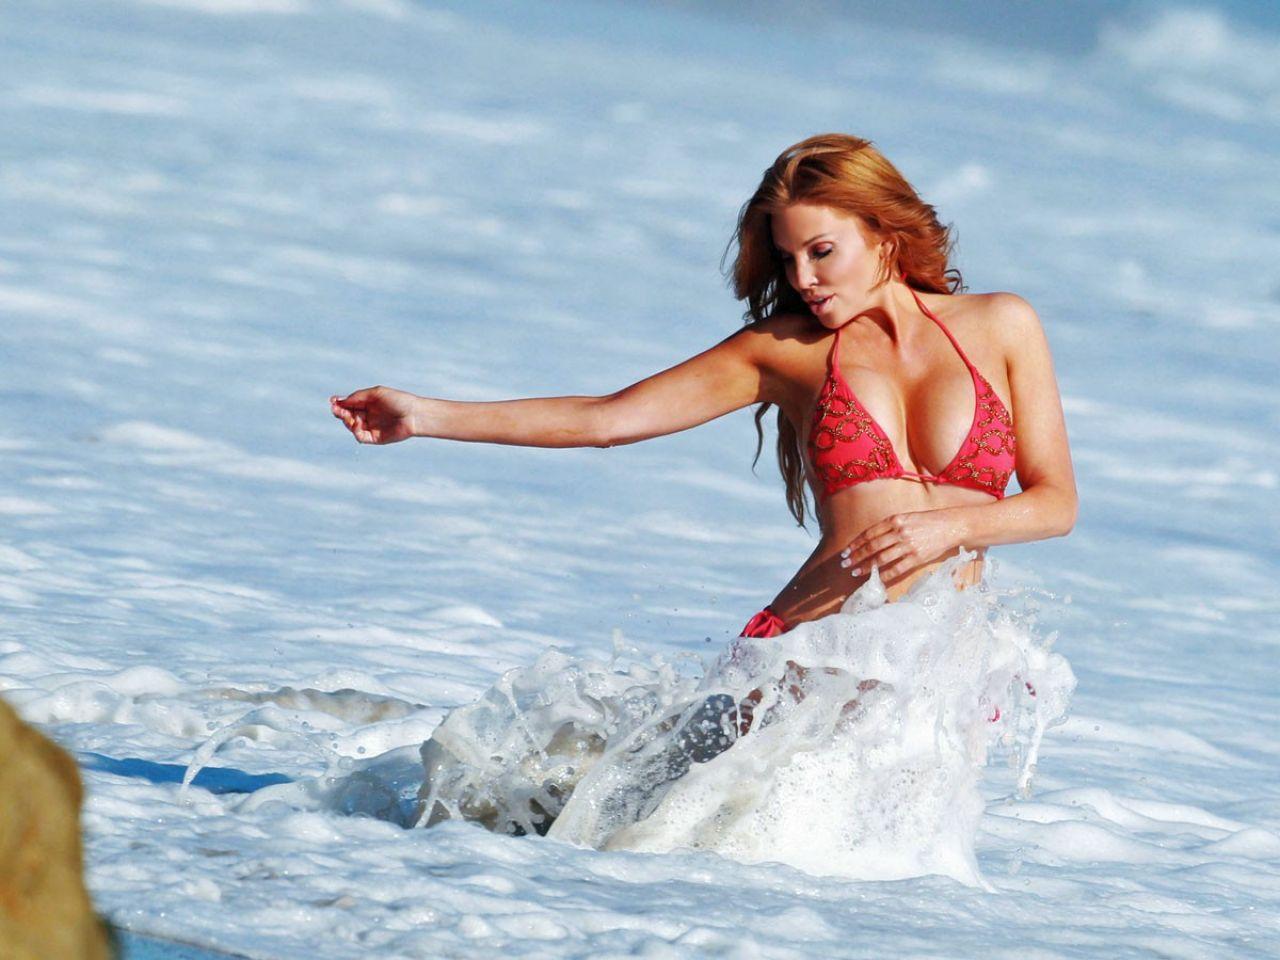 Angelica Bridges Baywatch Themed 138 Water Photo Shoot